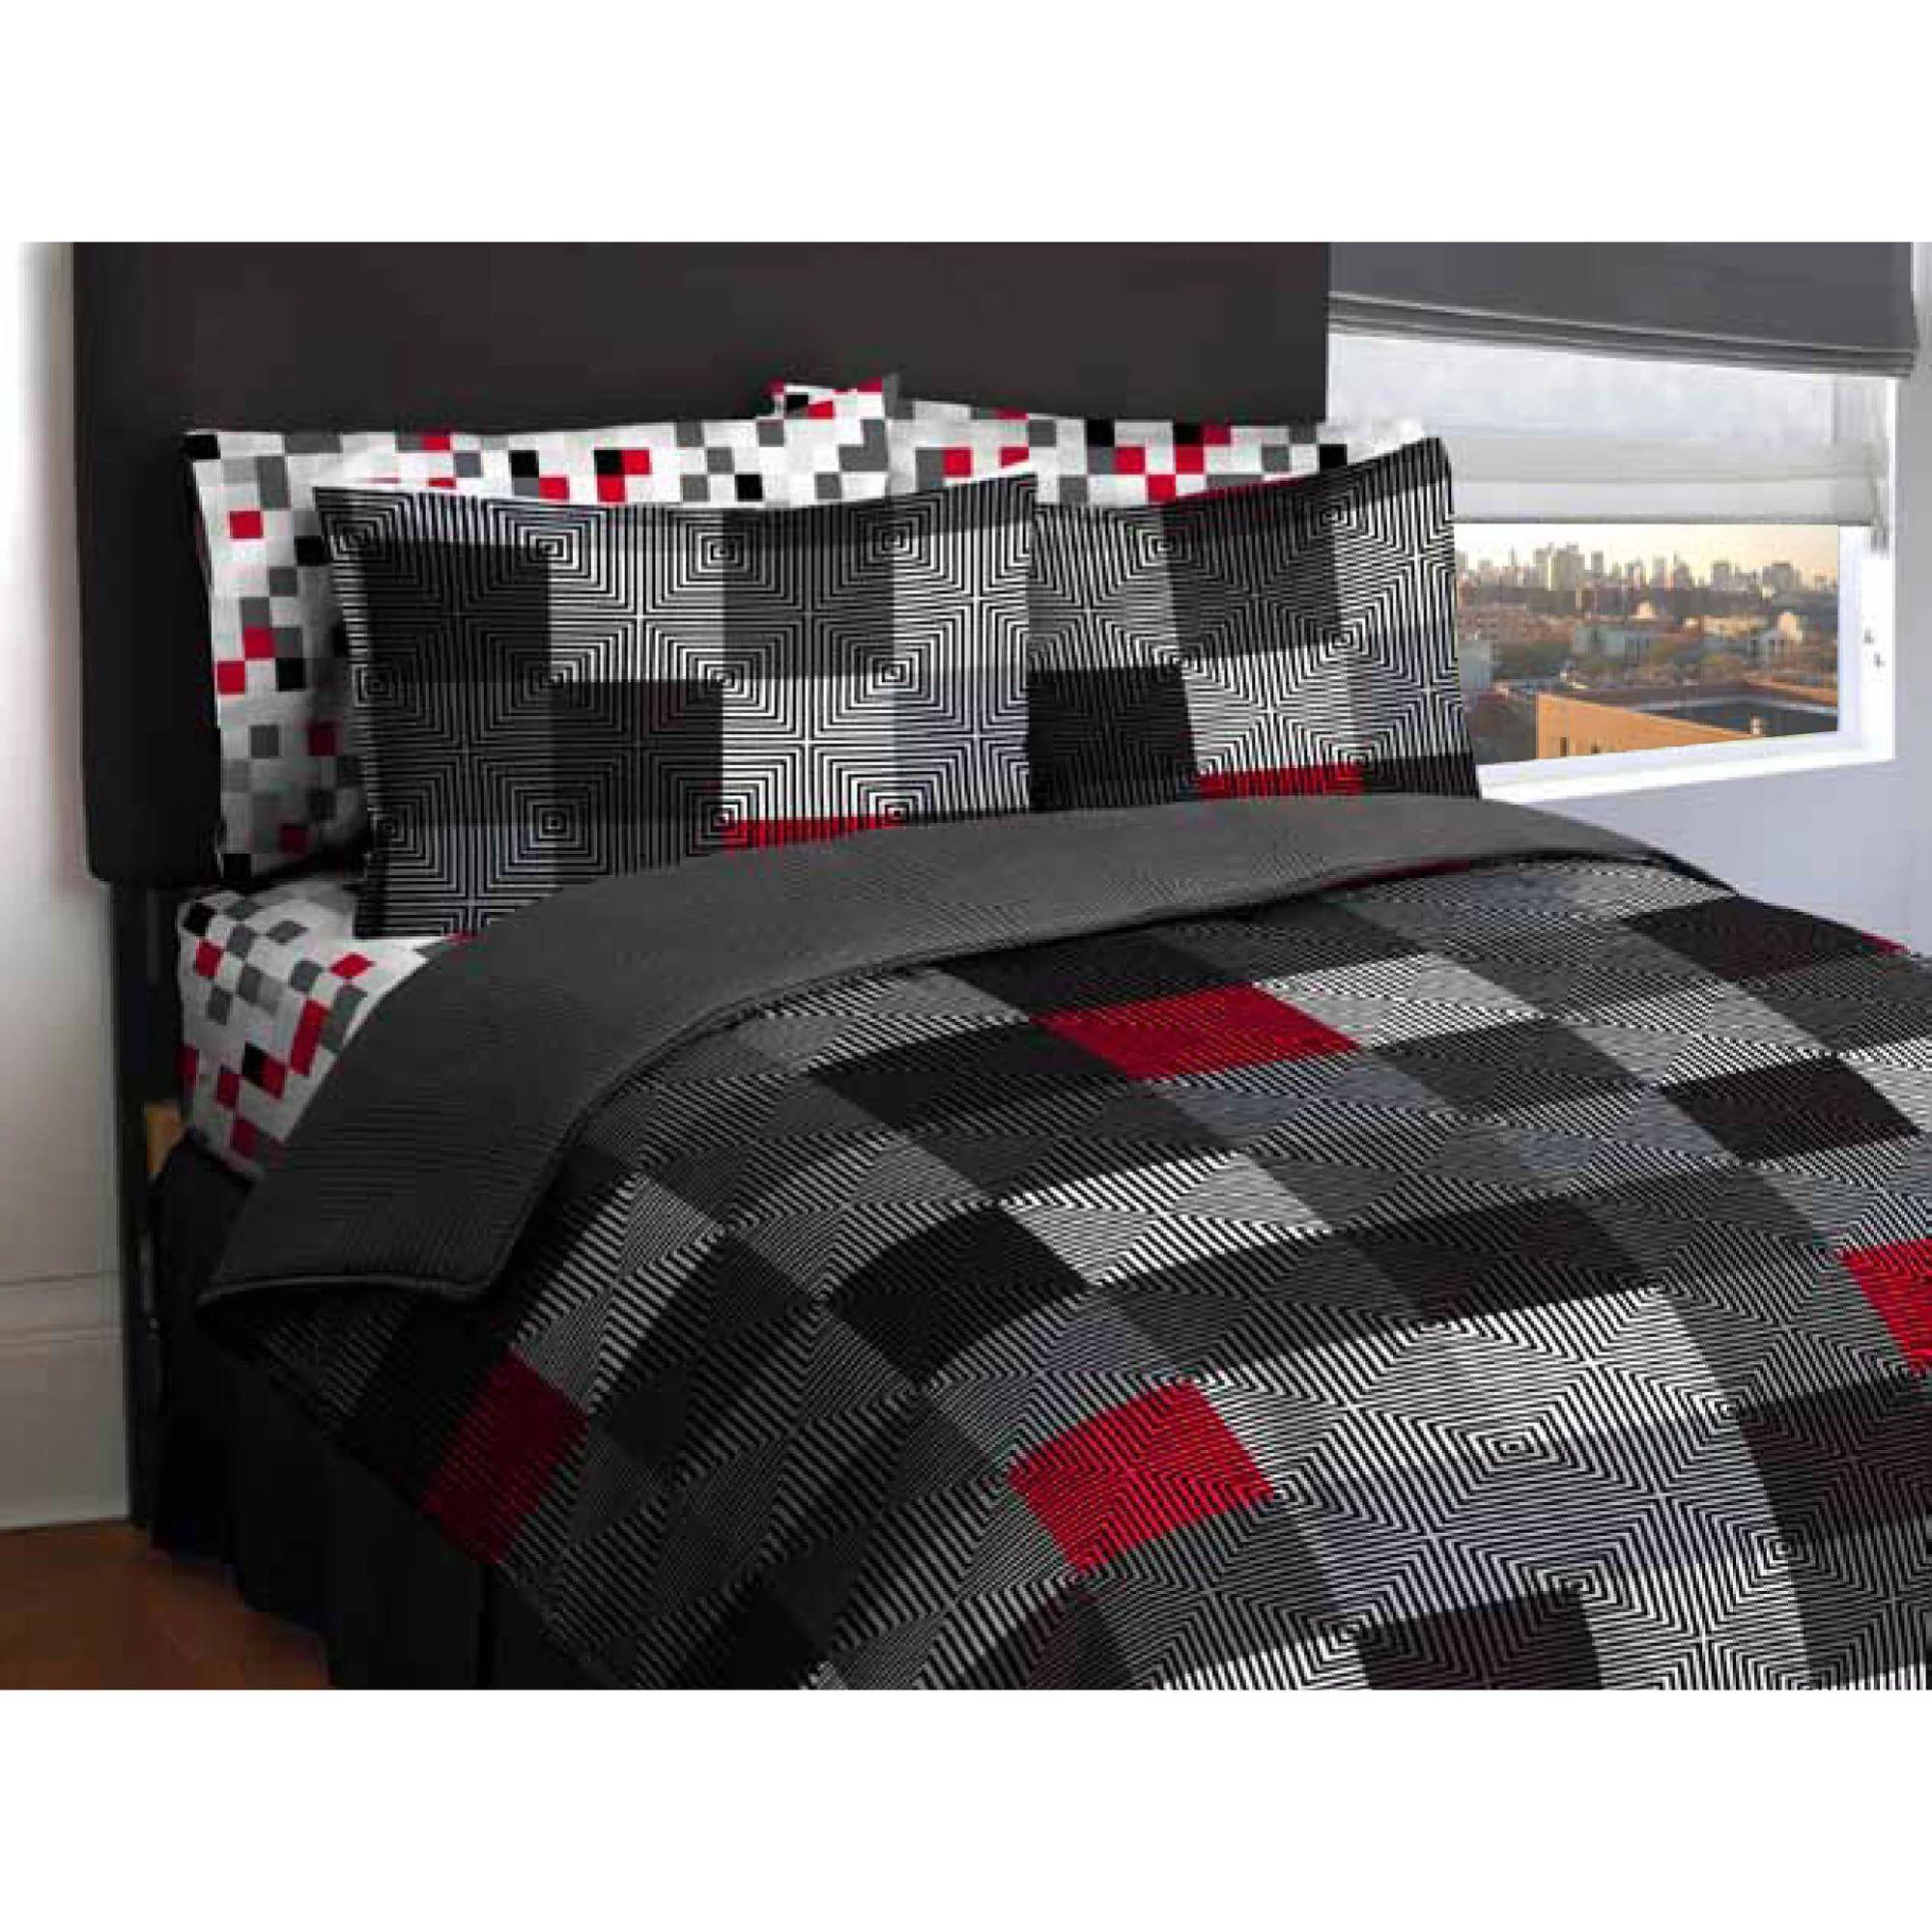 American original geo blocks bed in a bag bedding comforter set walmart com